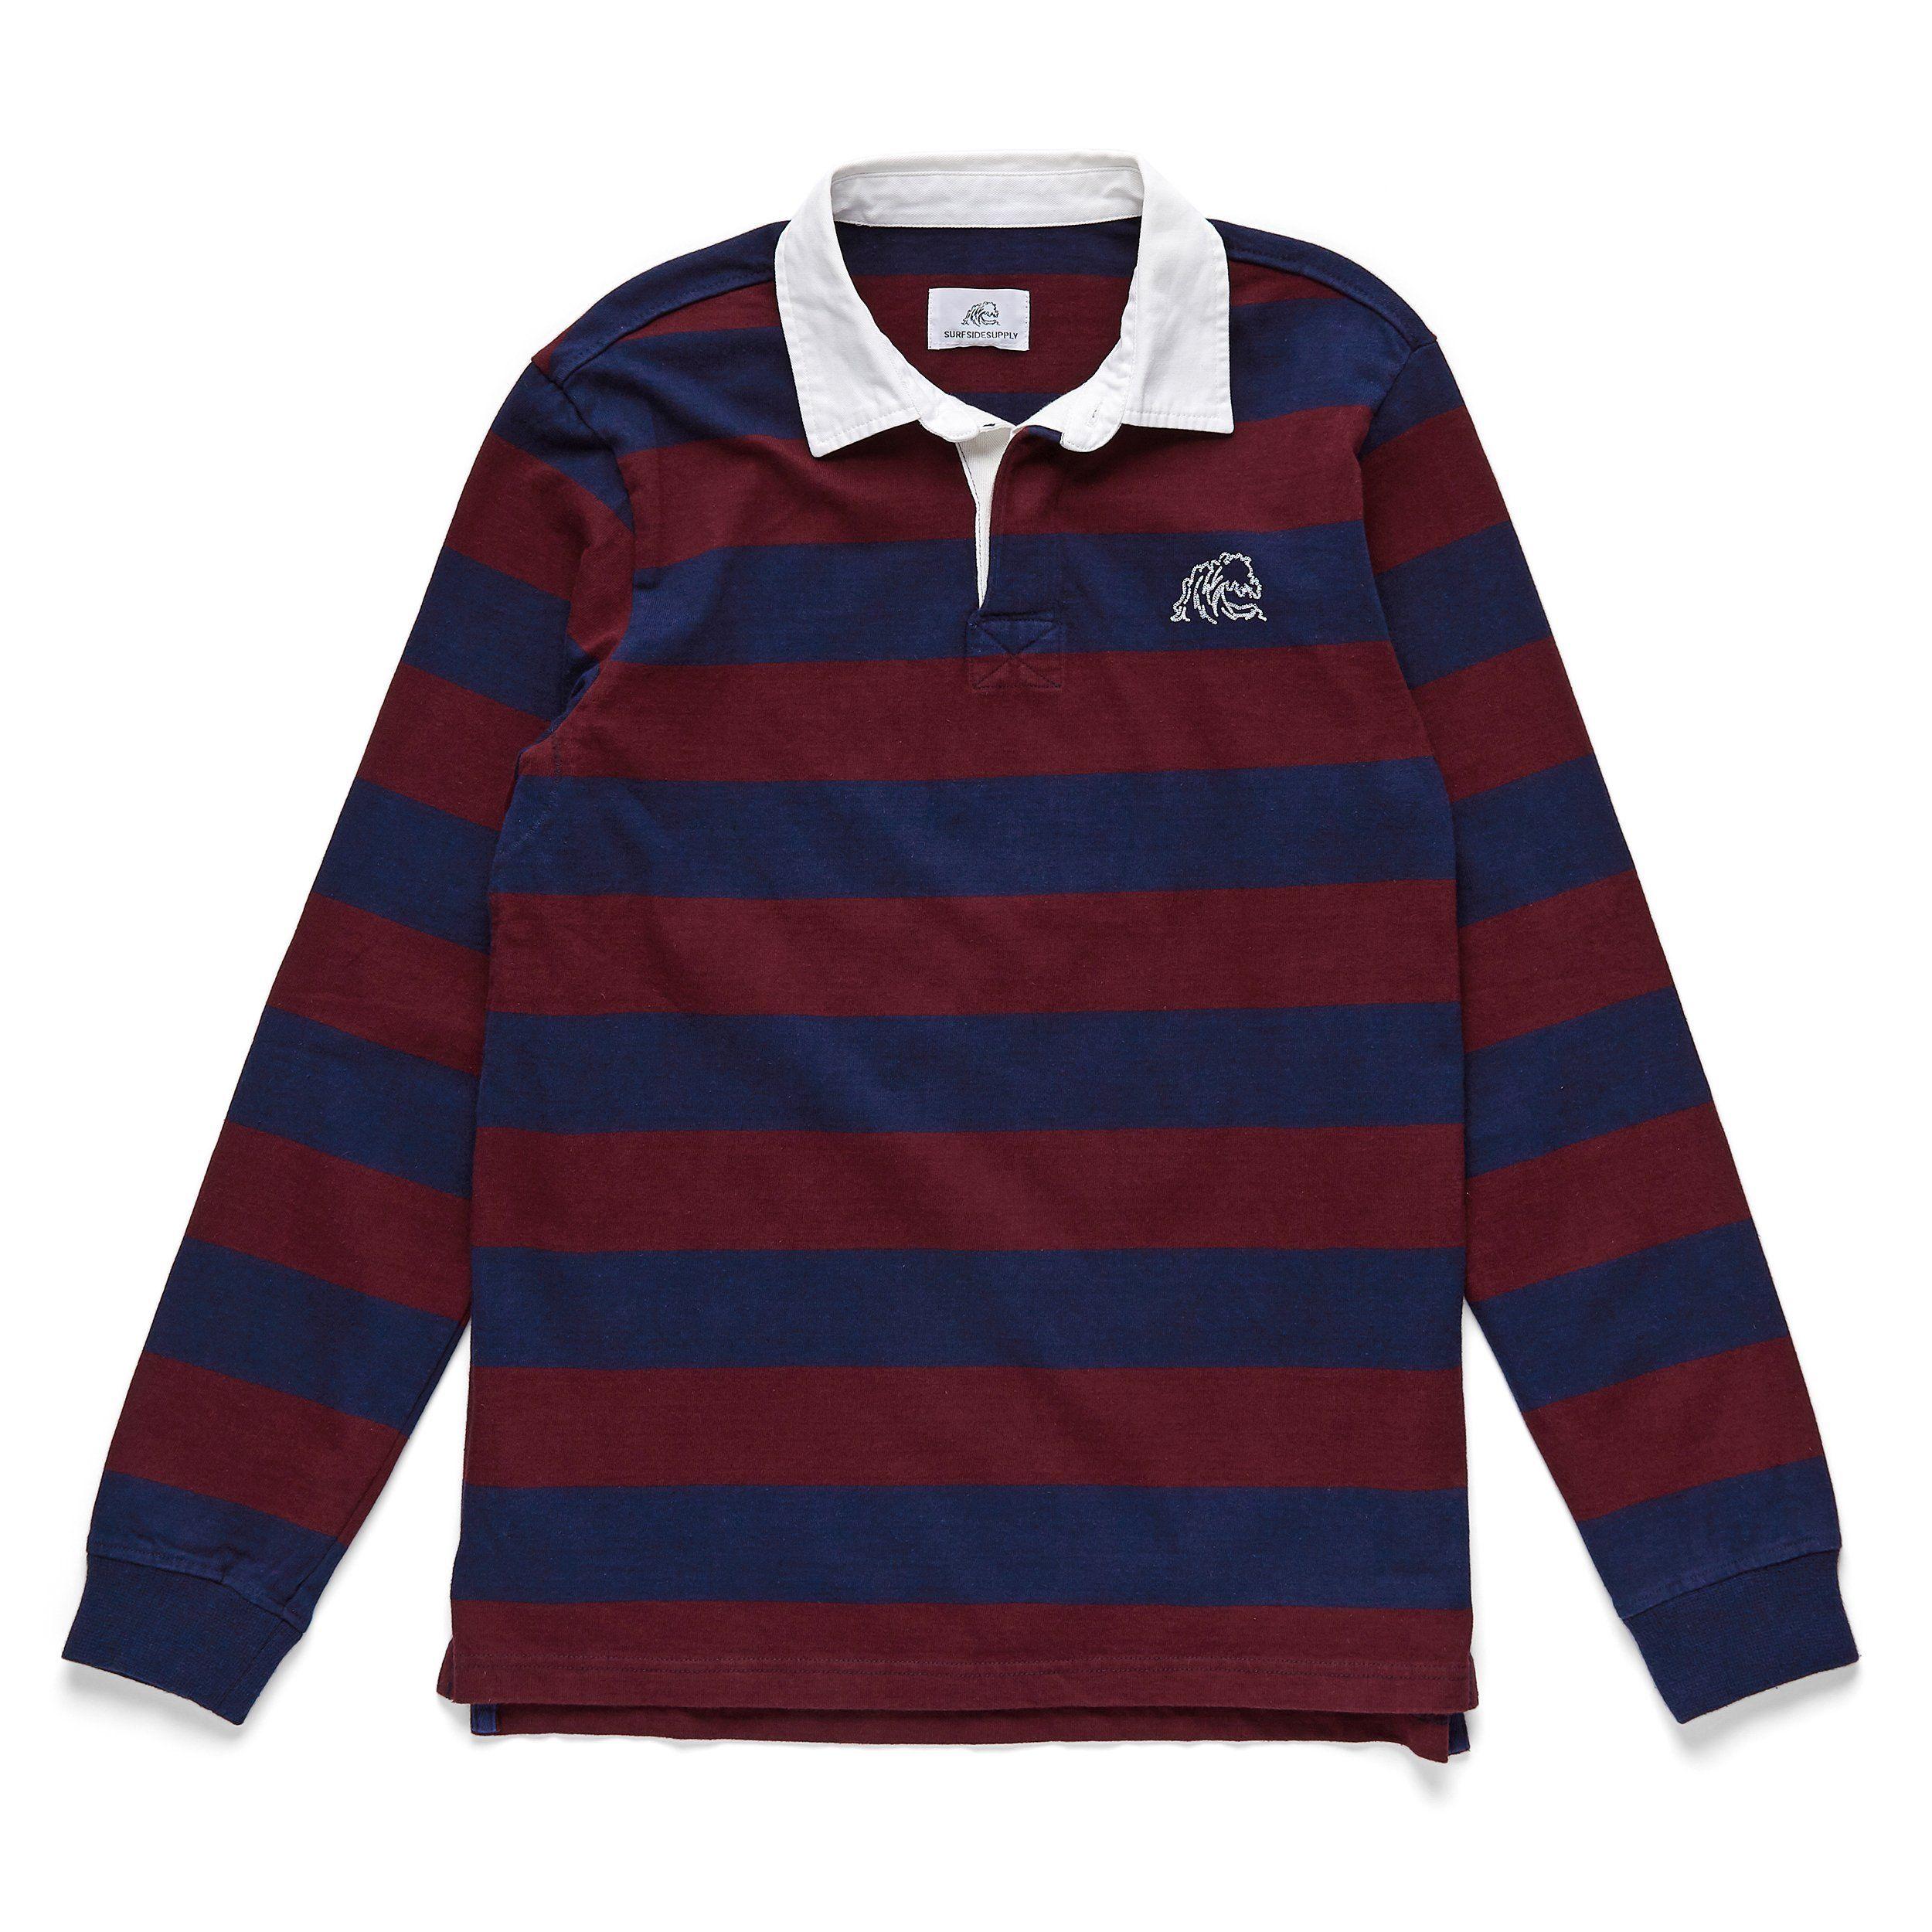 L/S Classic Rugby Shirt - Fig/Navy - Medium / Fig/Navy